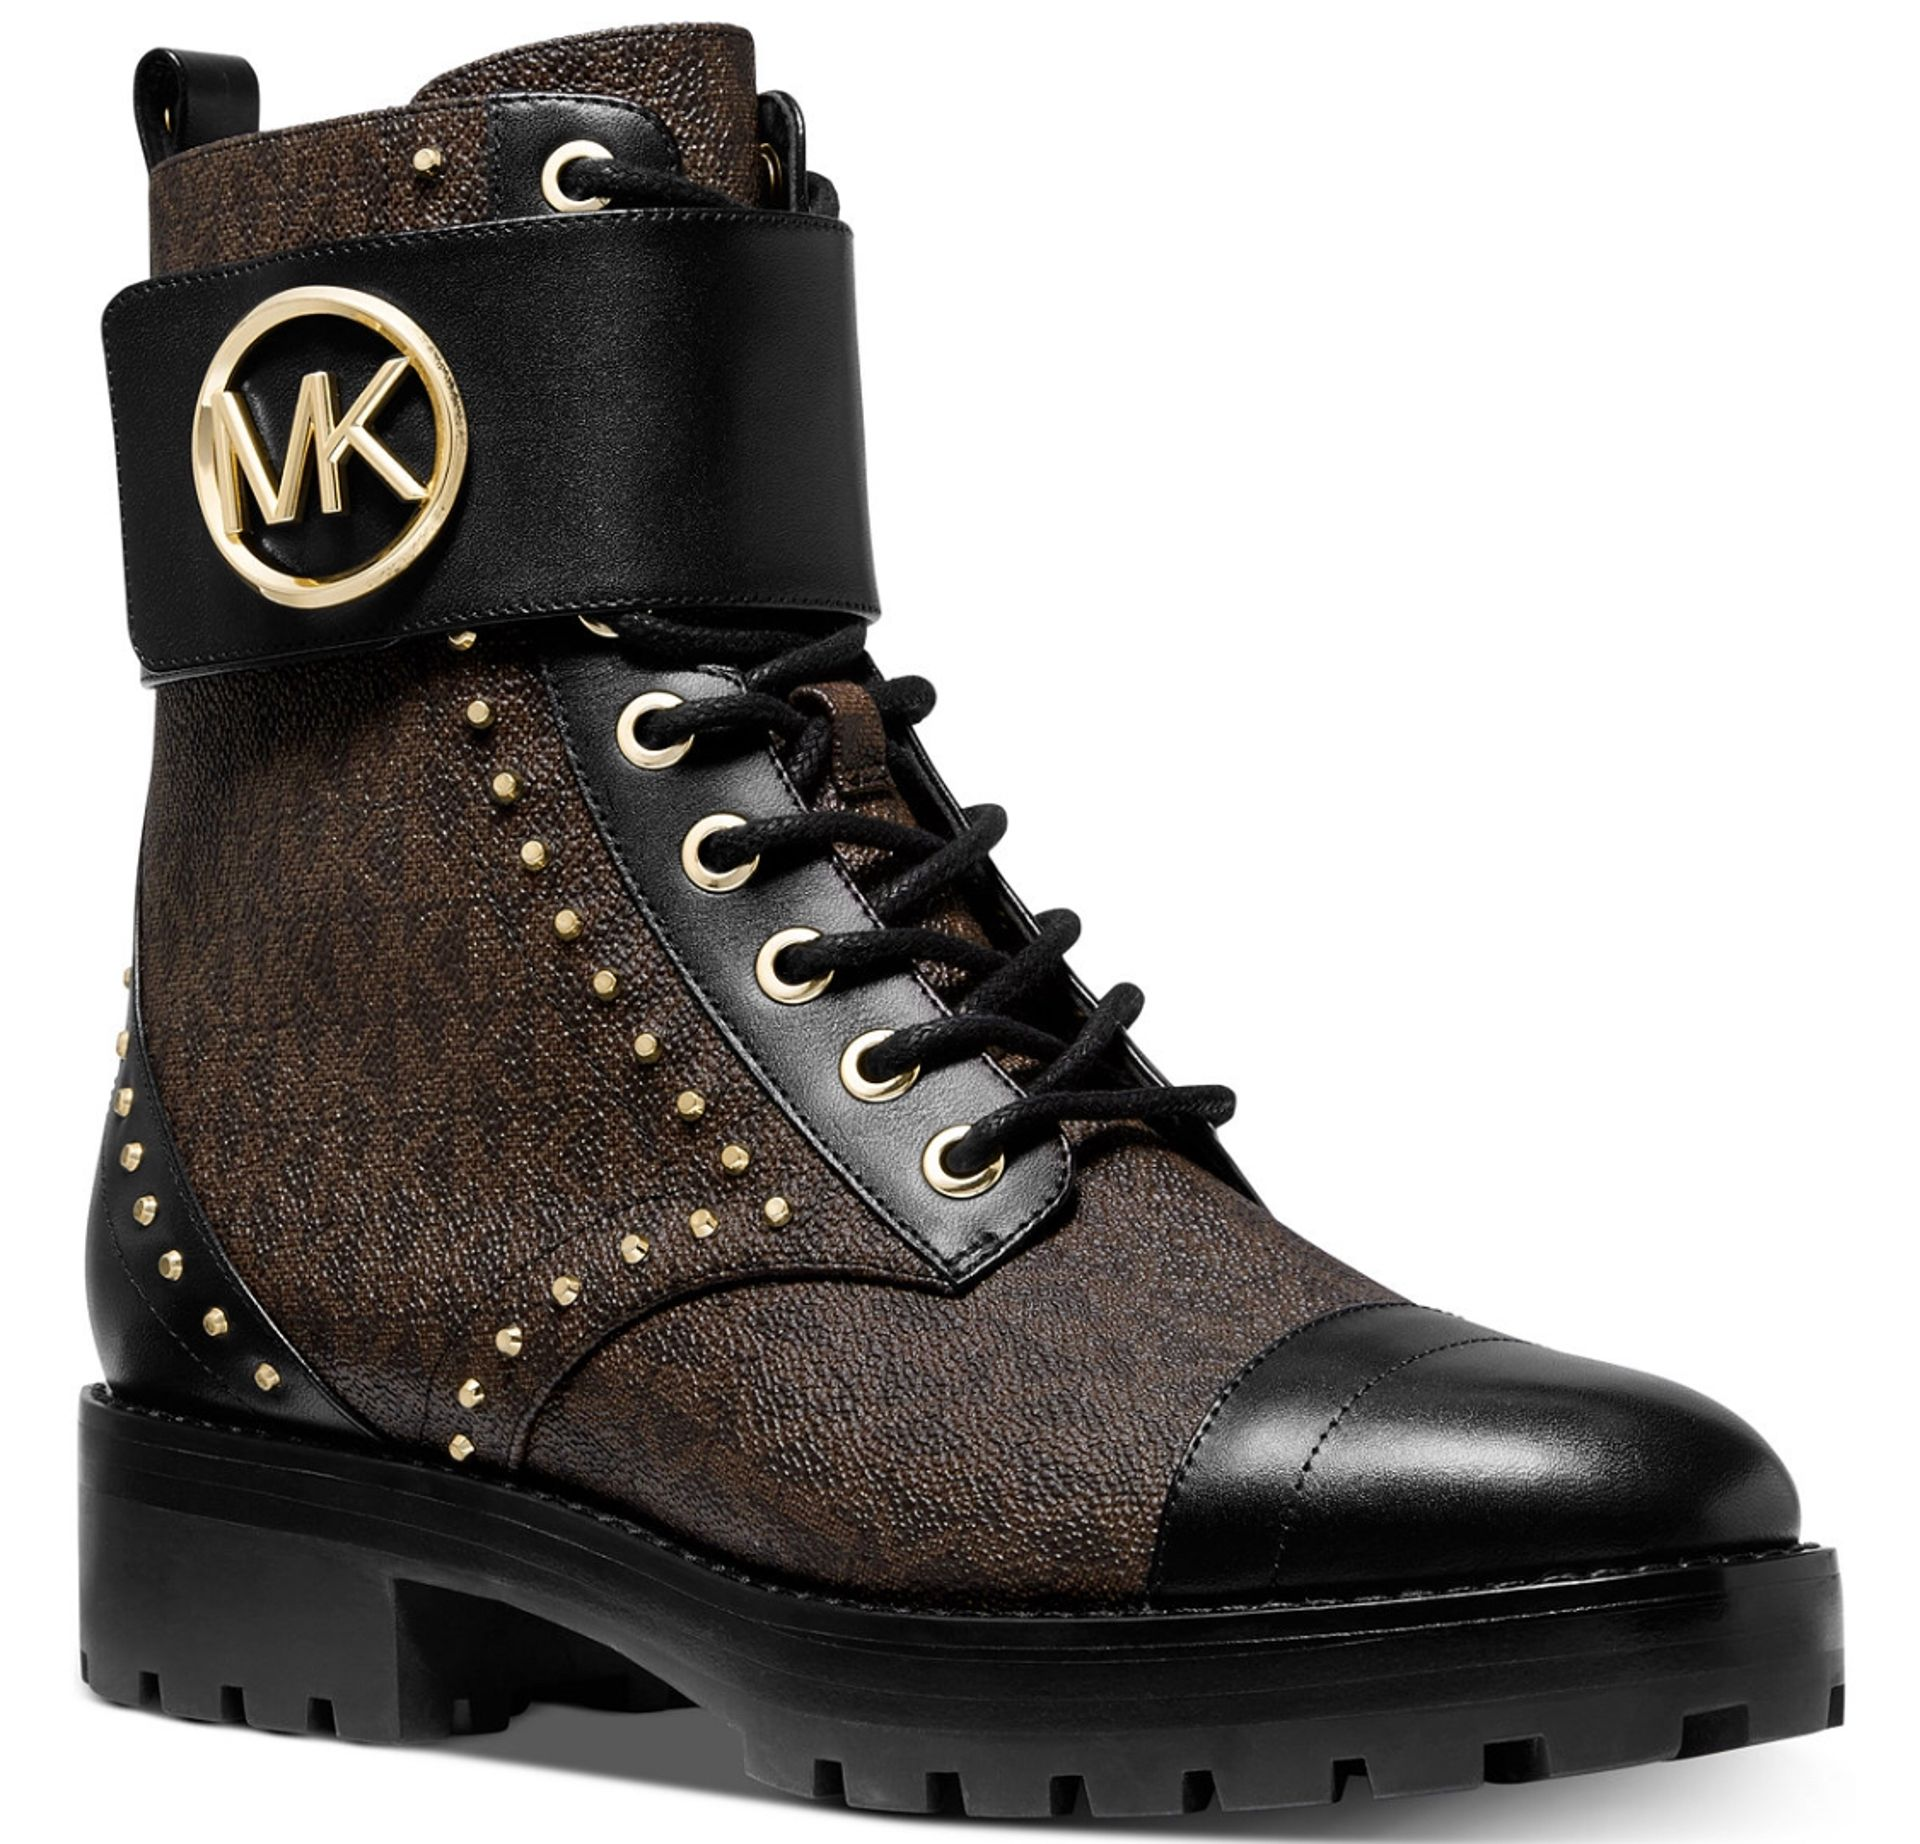 Tatum Combat Boots - Macys Style Crew